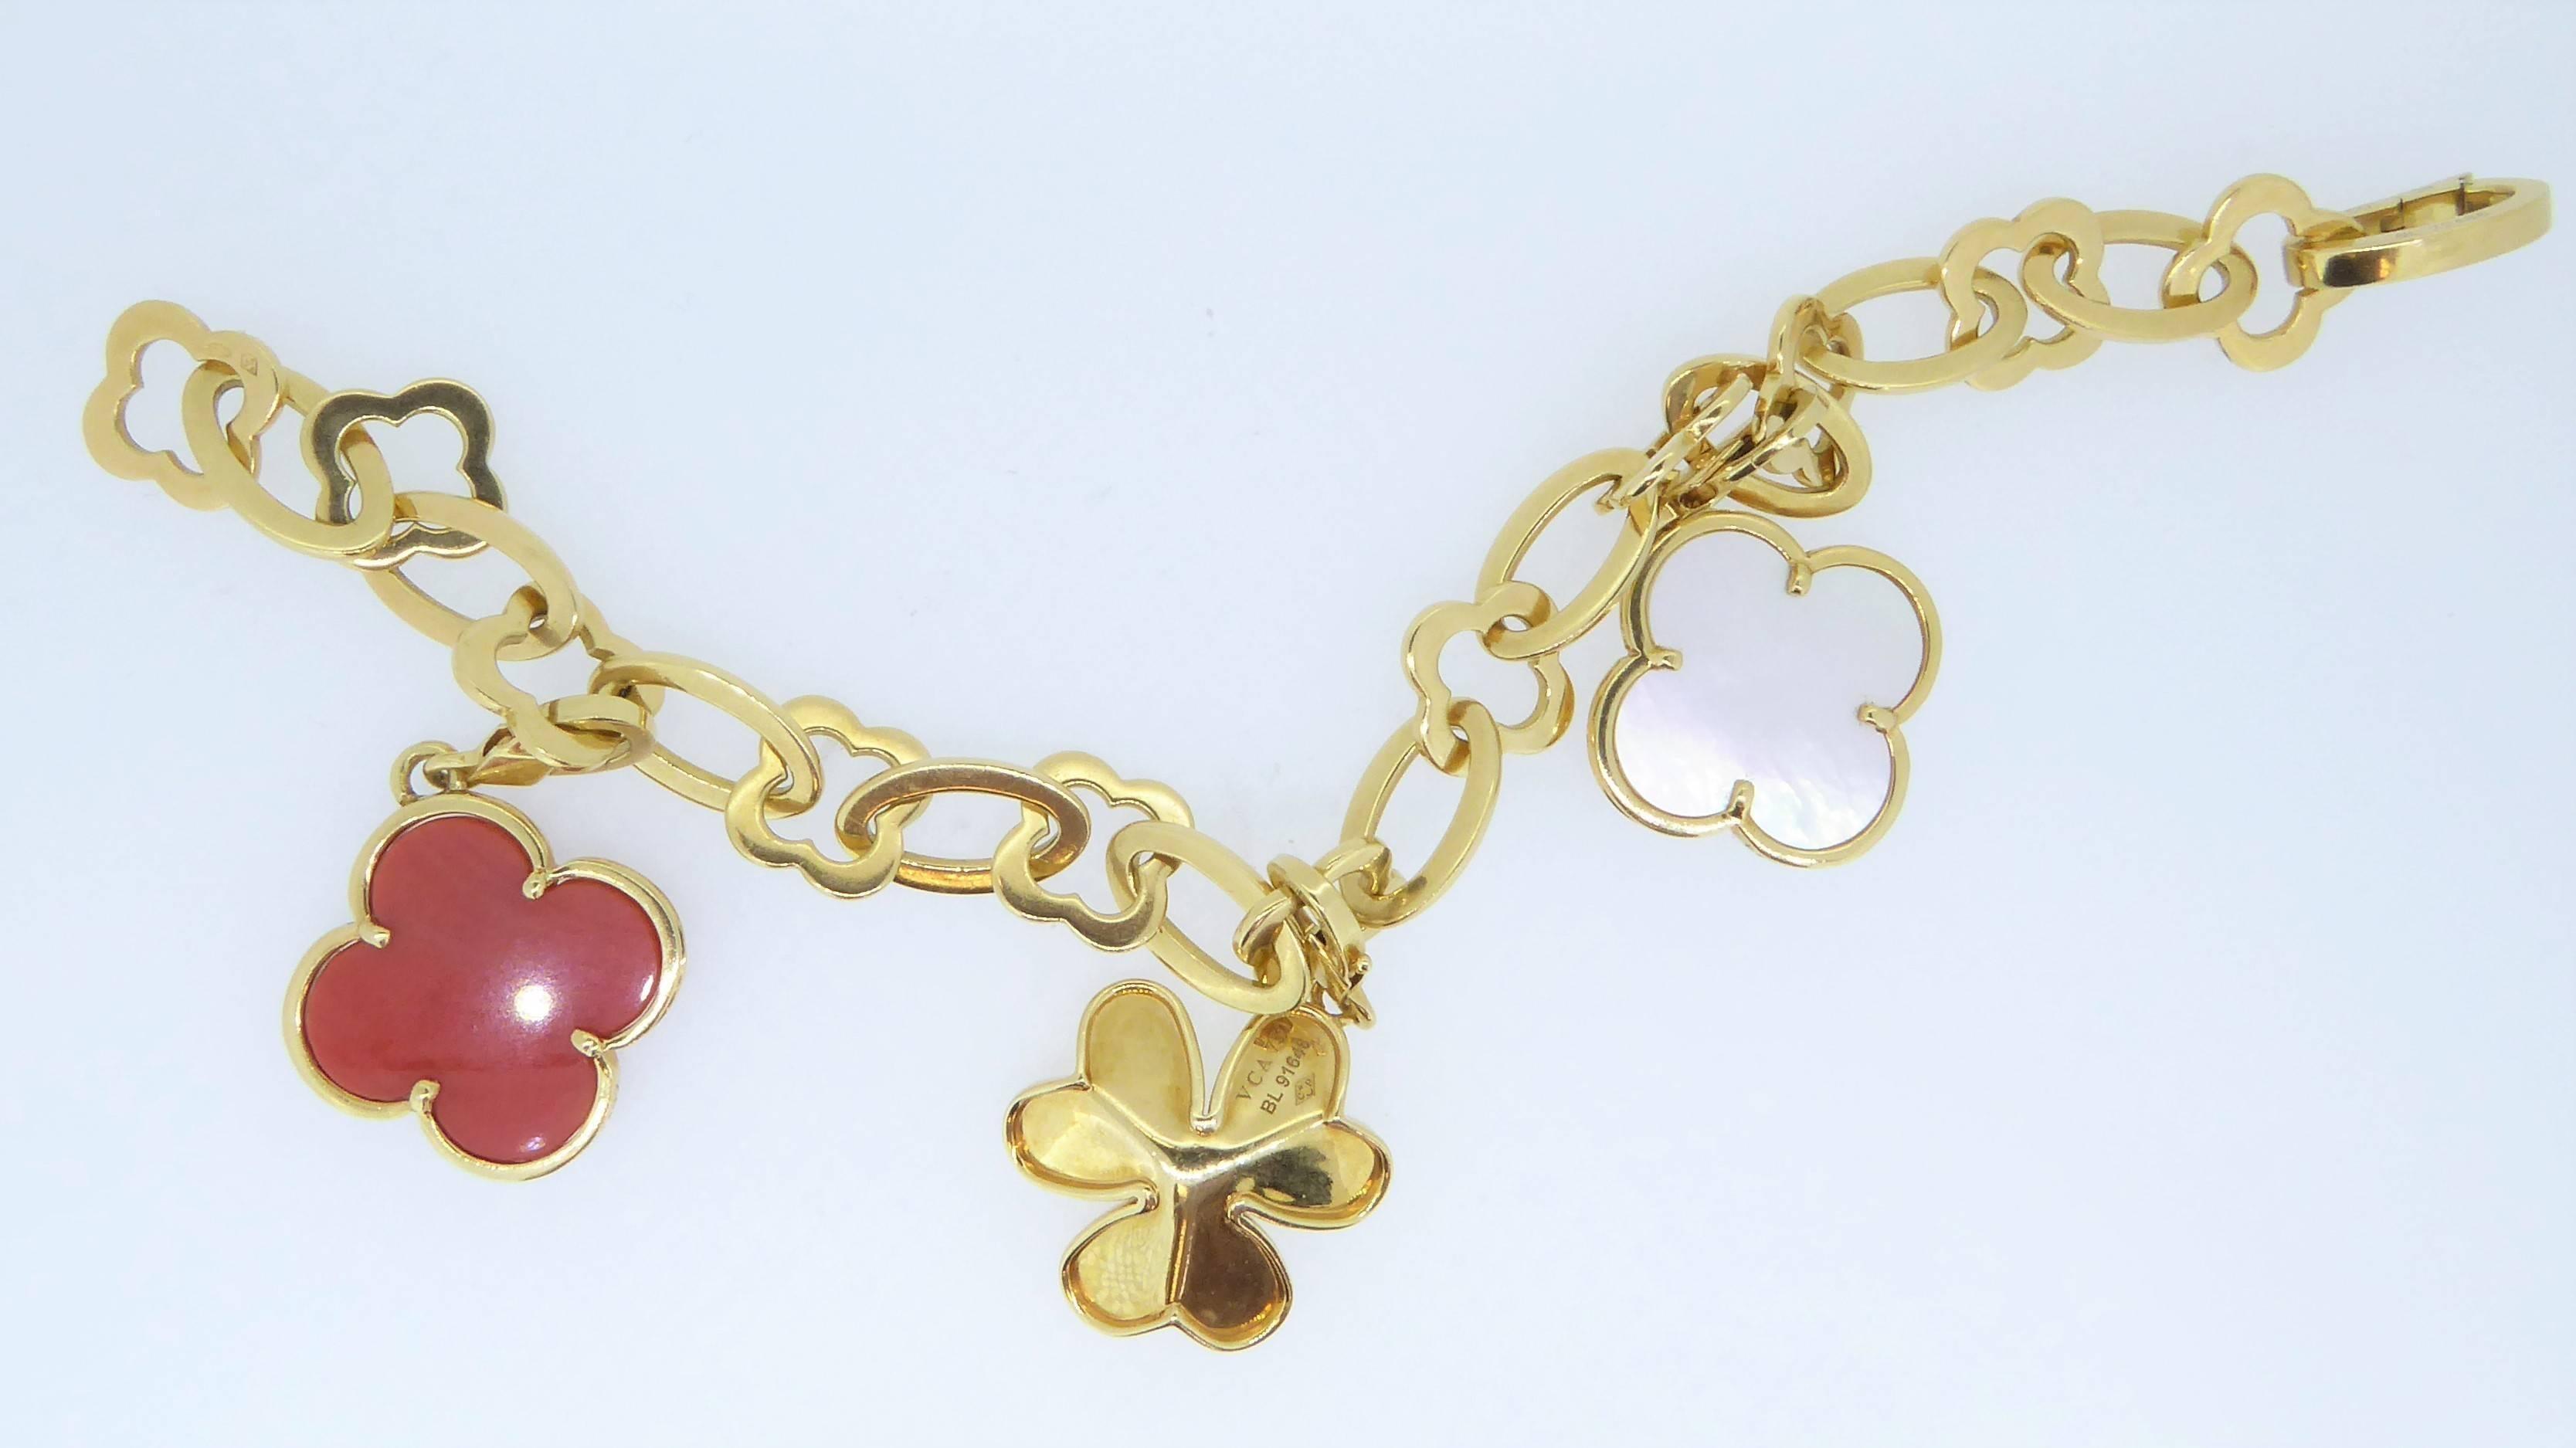 Van Cleef And Arpels 18 Carat Yellow Gold Diamond C Mop Charm Bracelet At 1stdibs